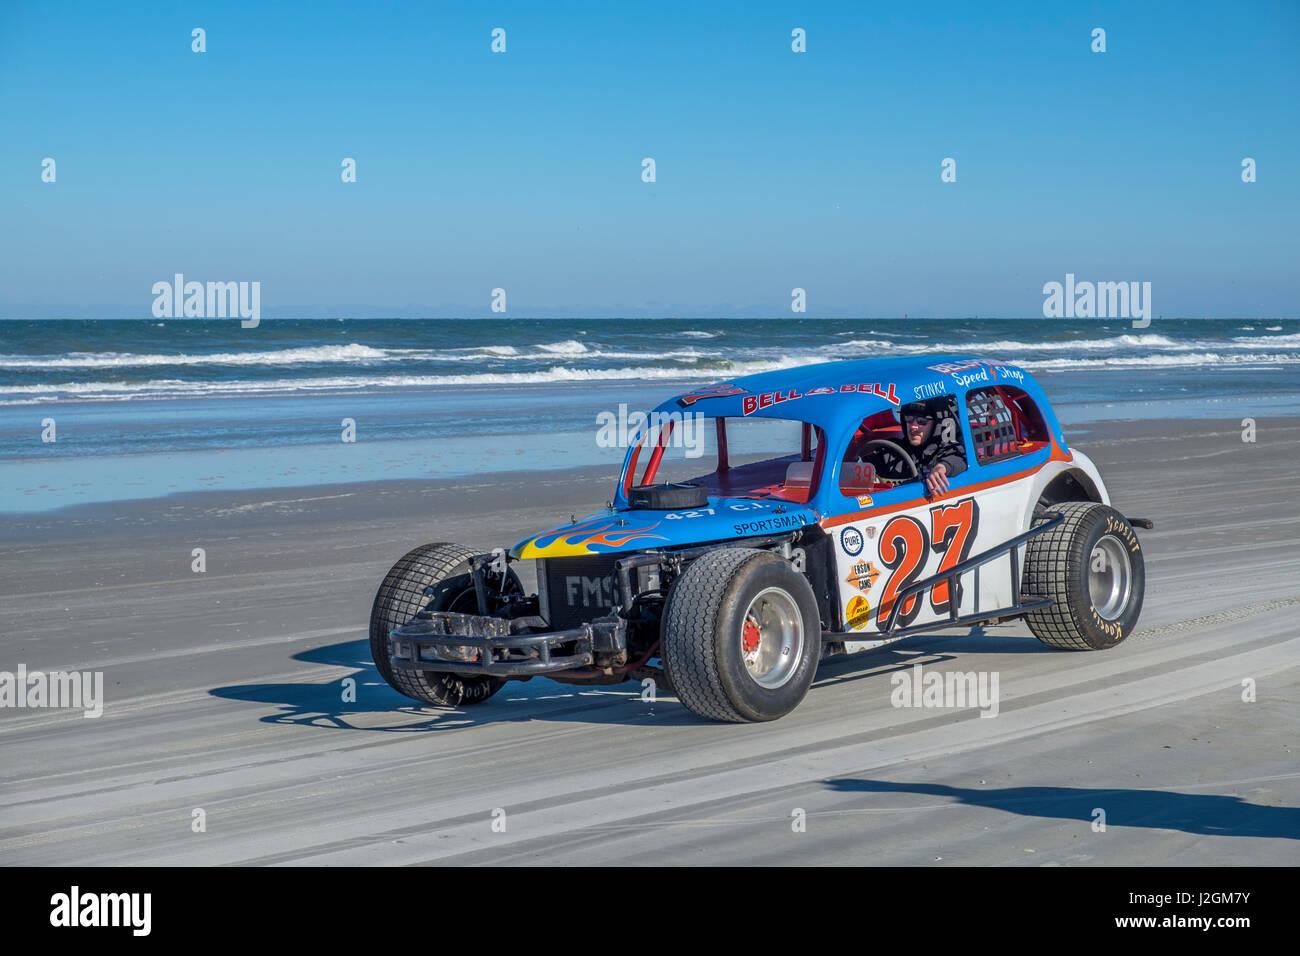 Antique NASCAR cars, North Turn, Ponce Inlet, Florida, USA - Stock-Bilder